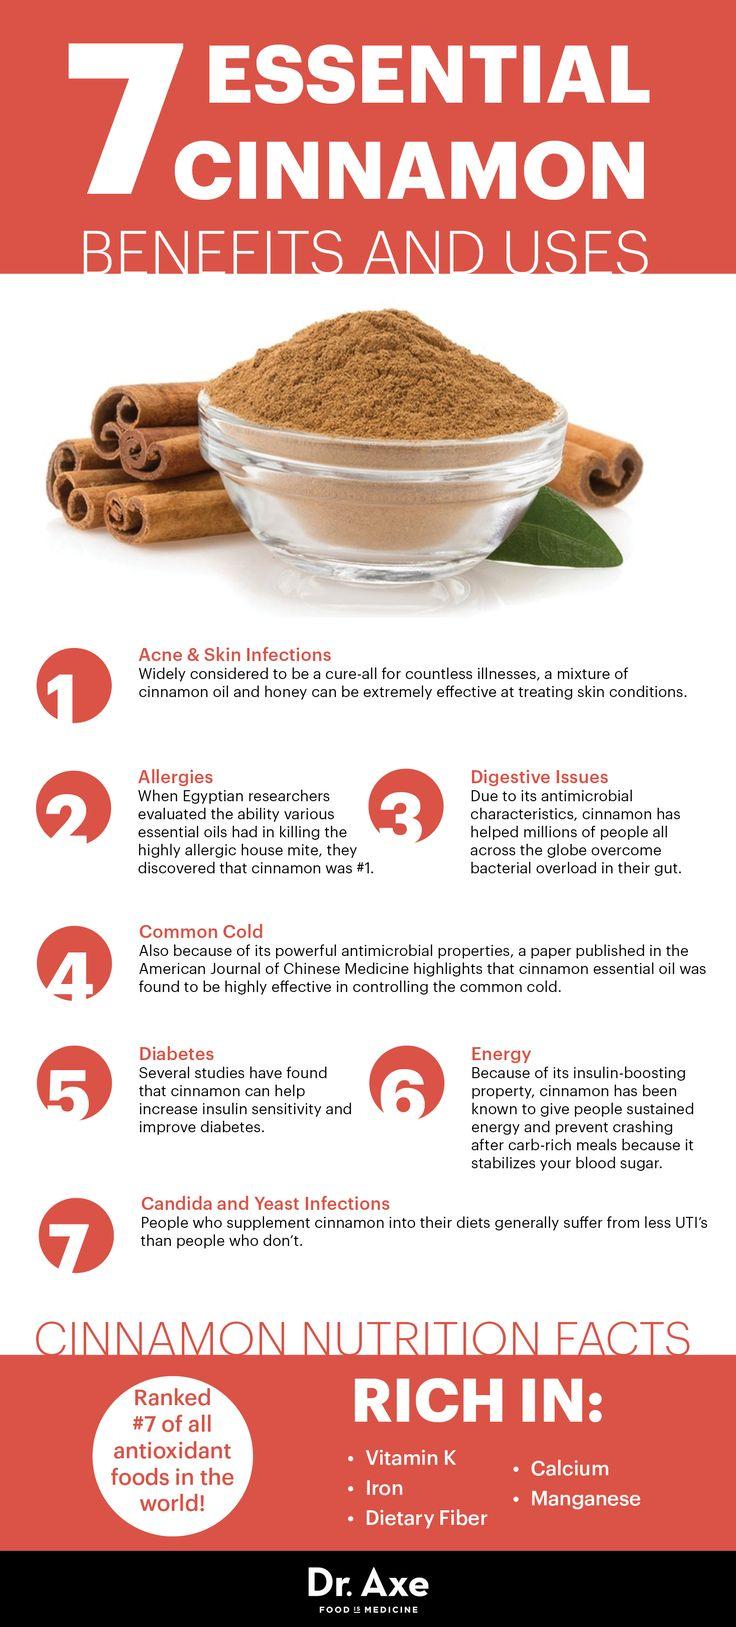 Ceylon Cinnamon Supplementation preferred ~ 1,200 mg for Diabetes